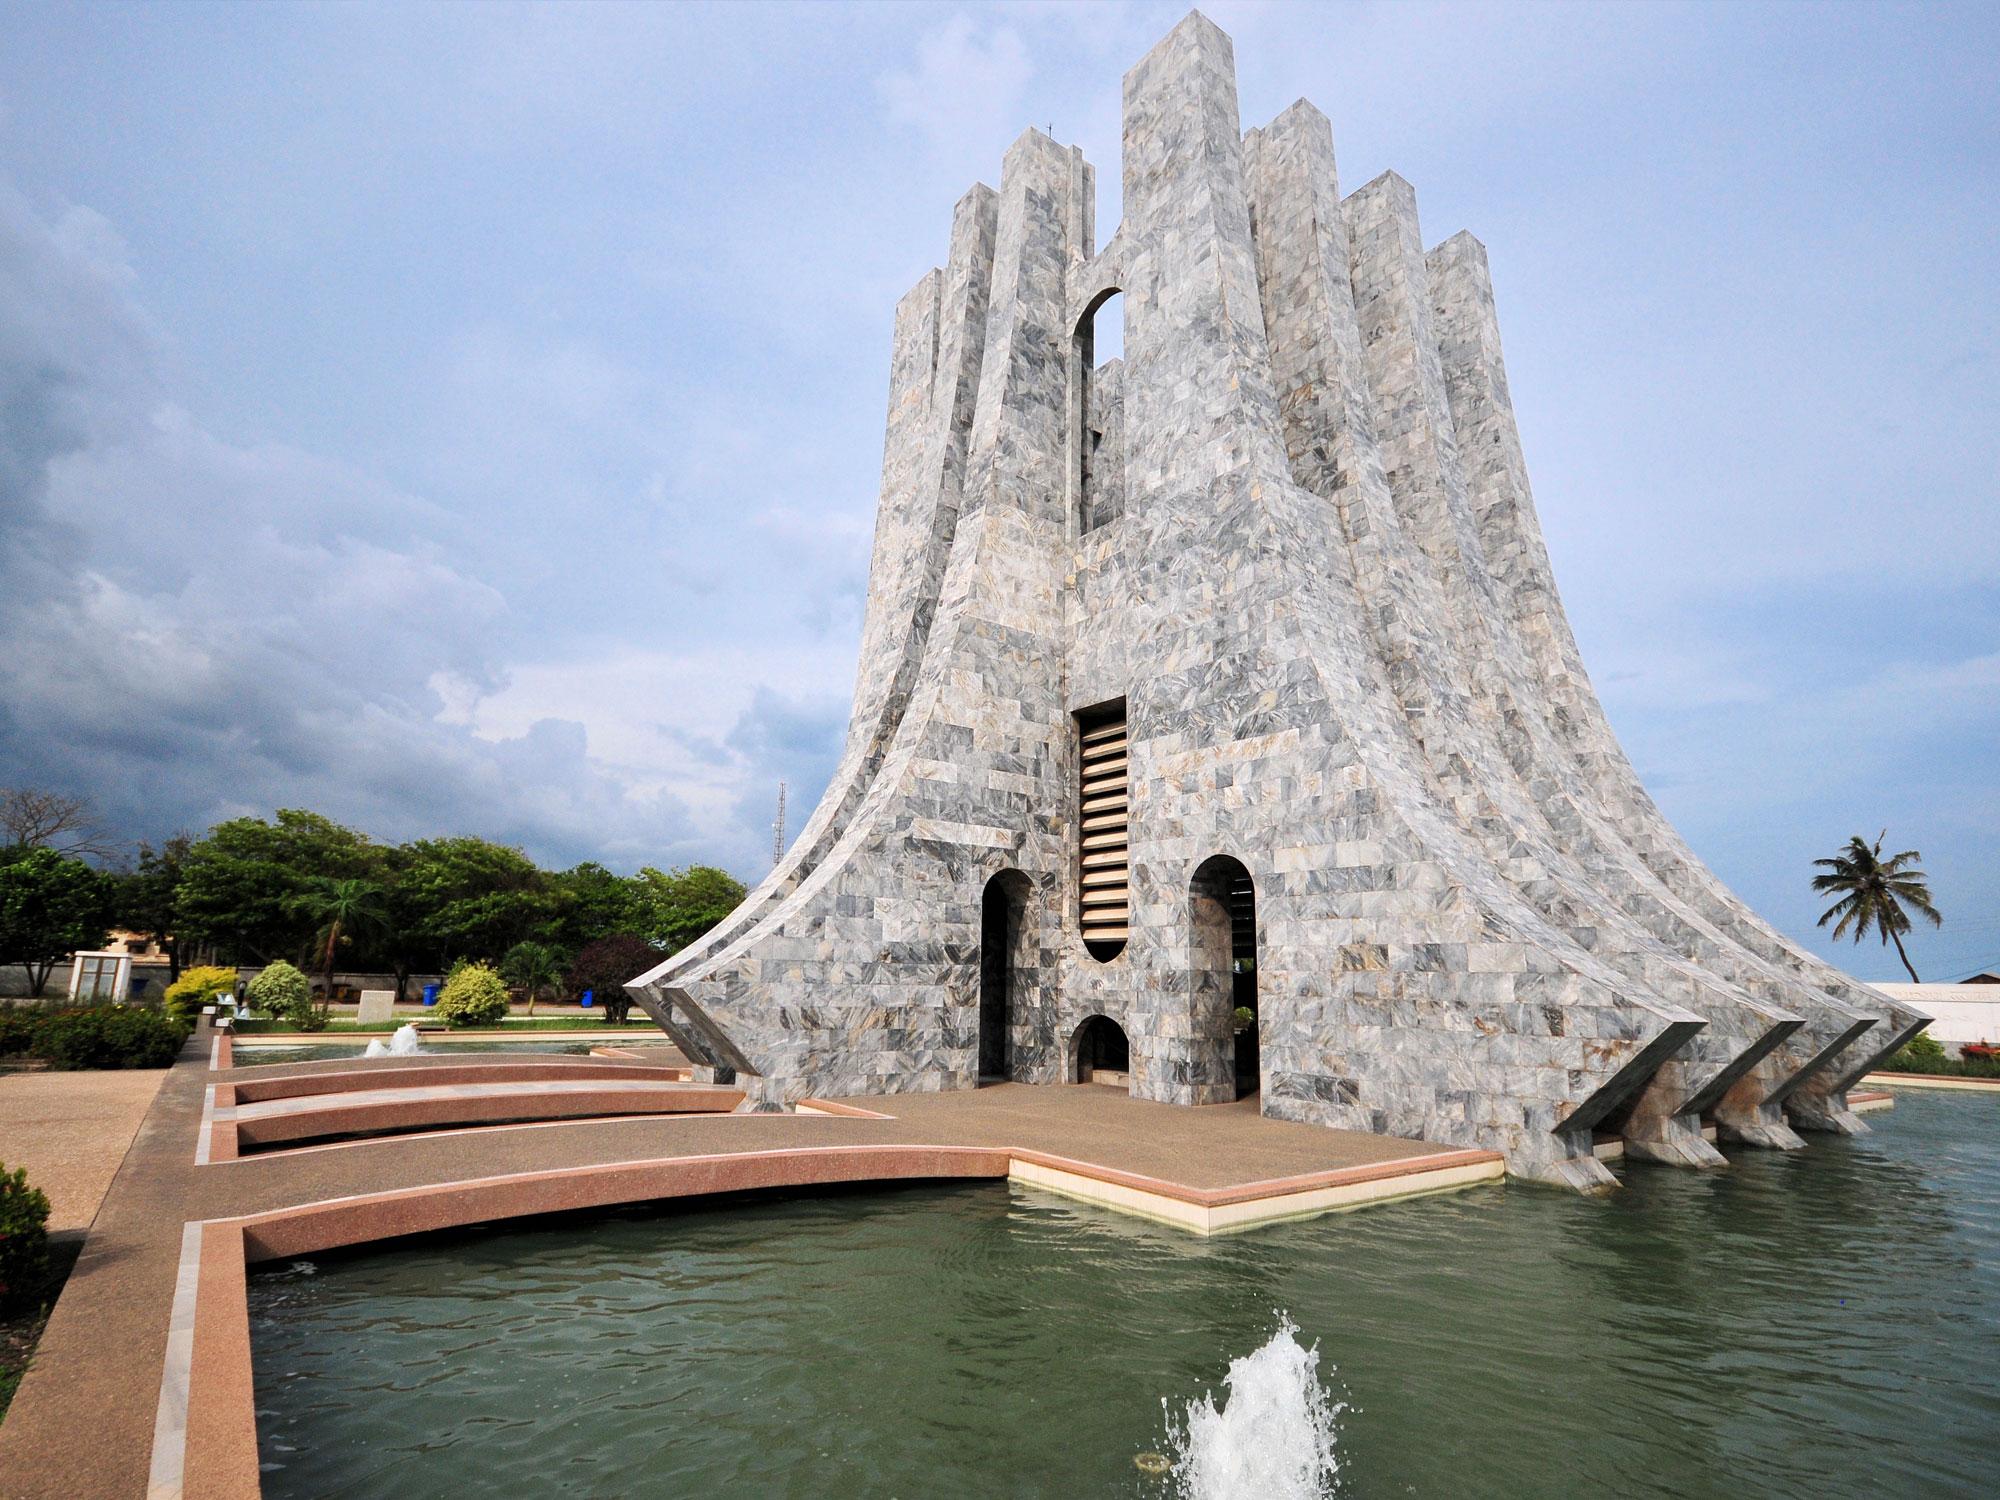 Kwame Nkrumah Park in Accra, Ghana.